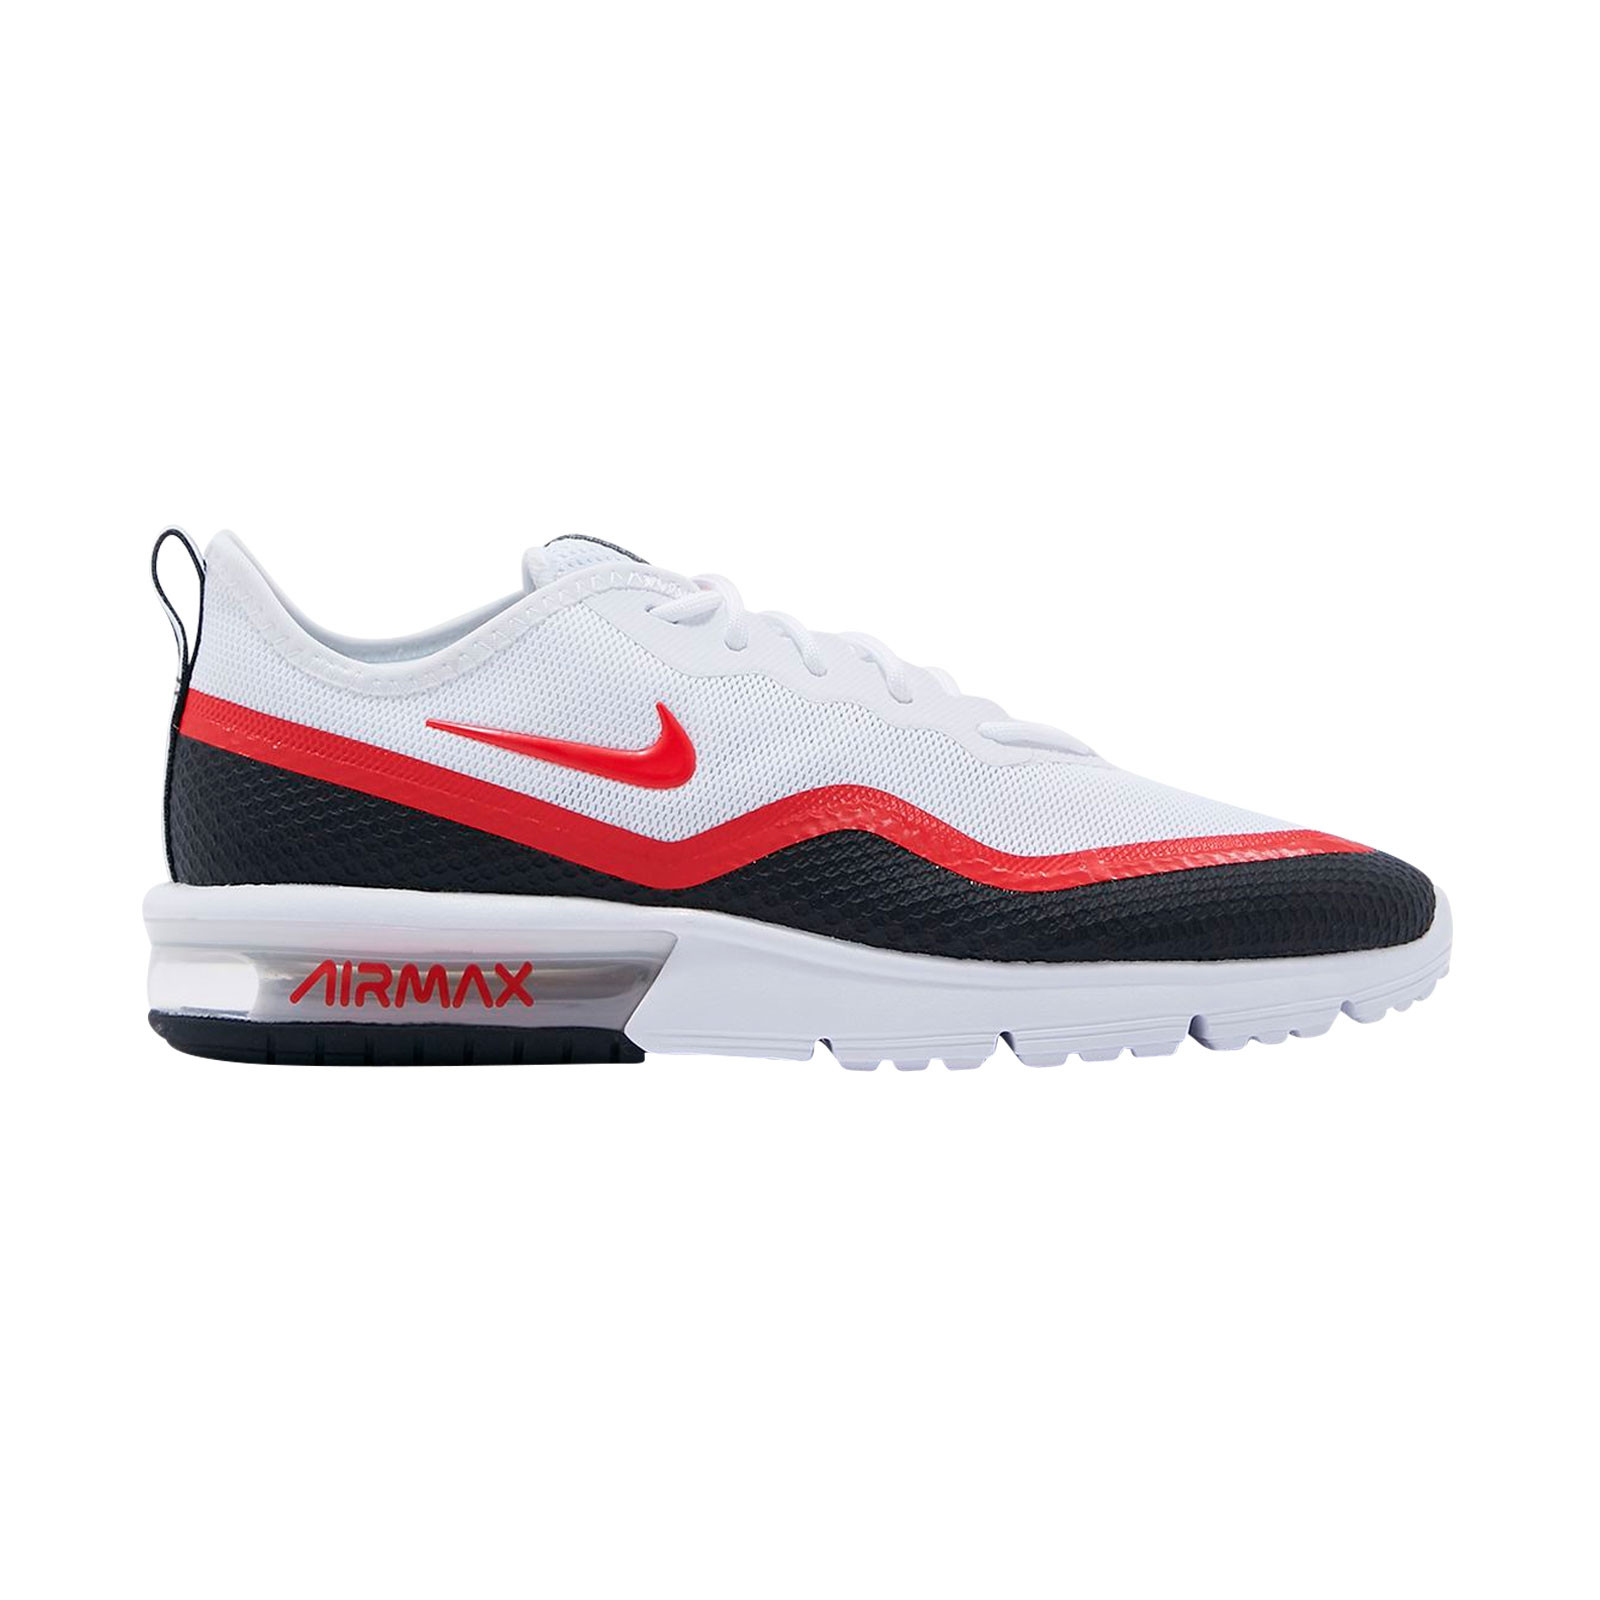 Zapatillas Nike Air Max Sequent 4.5 Se Running para Hombre